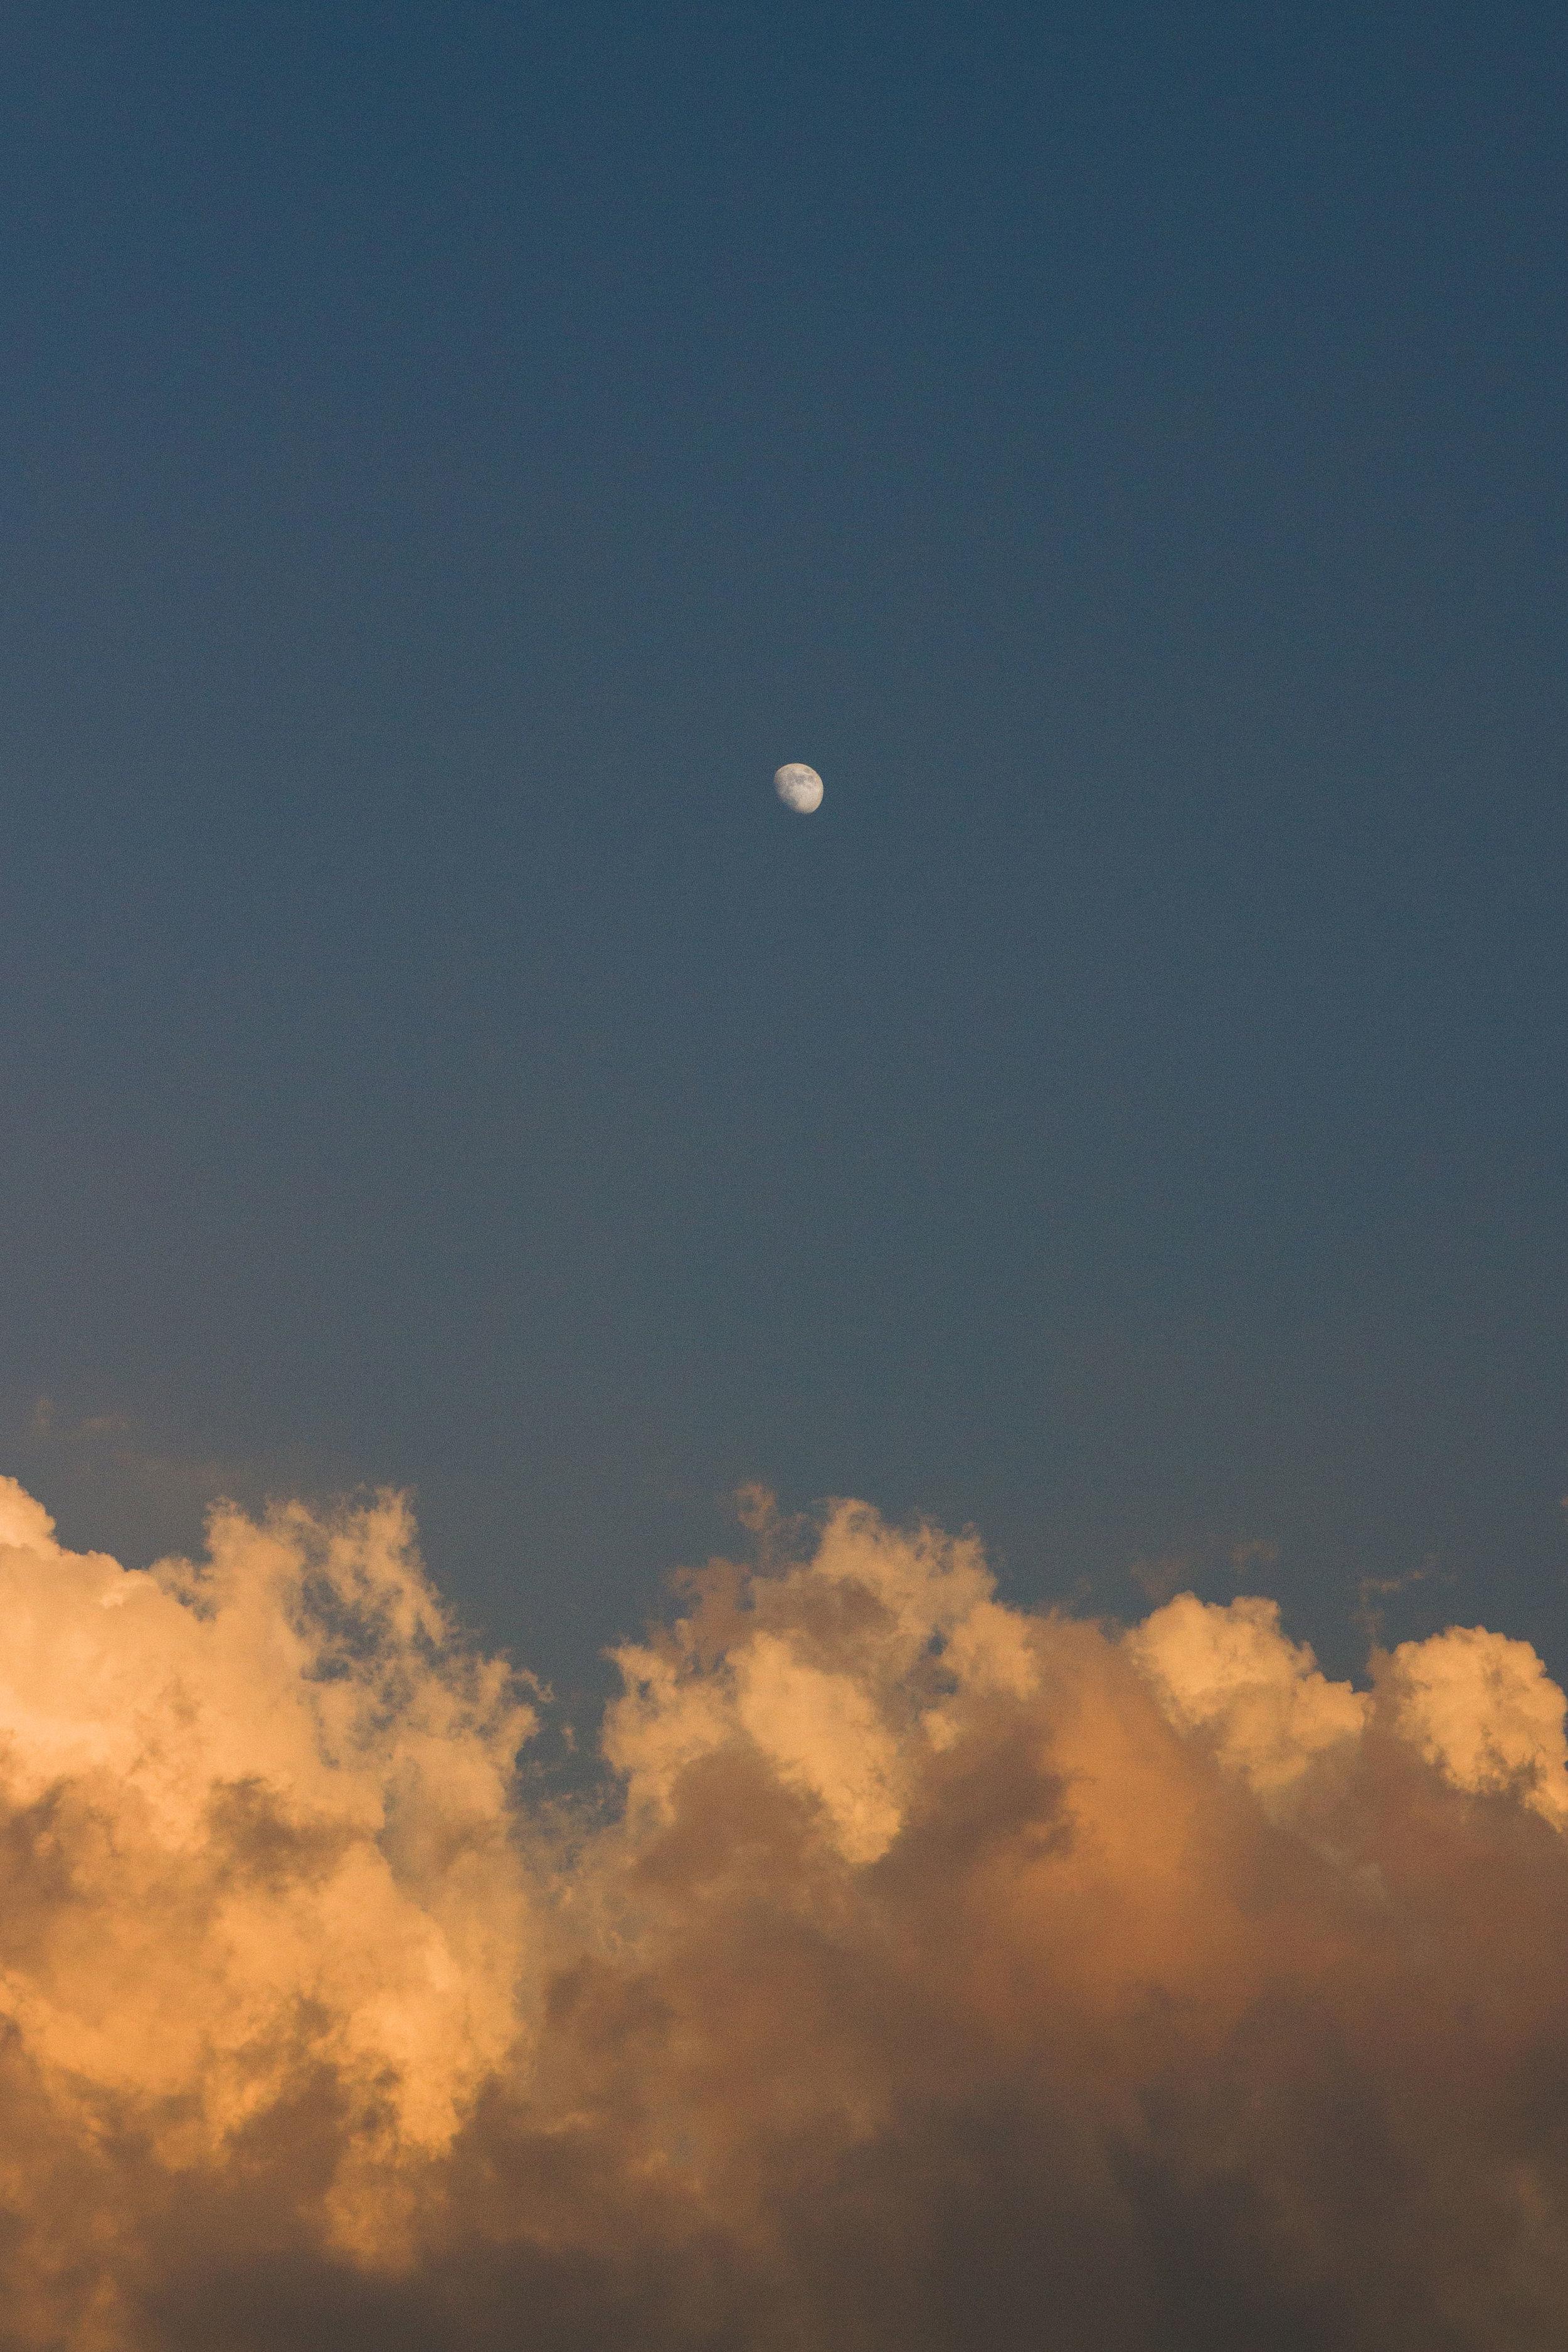 SKY+_MOON.jpg